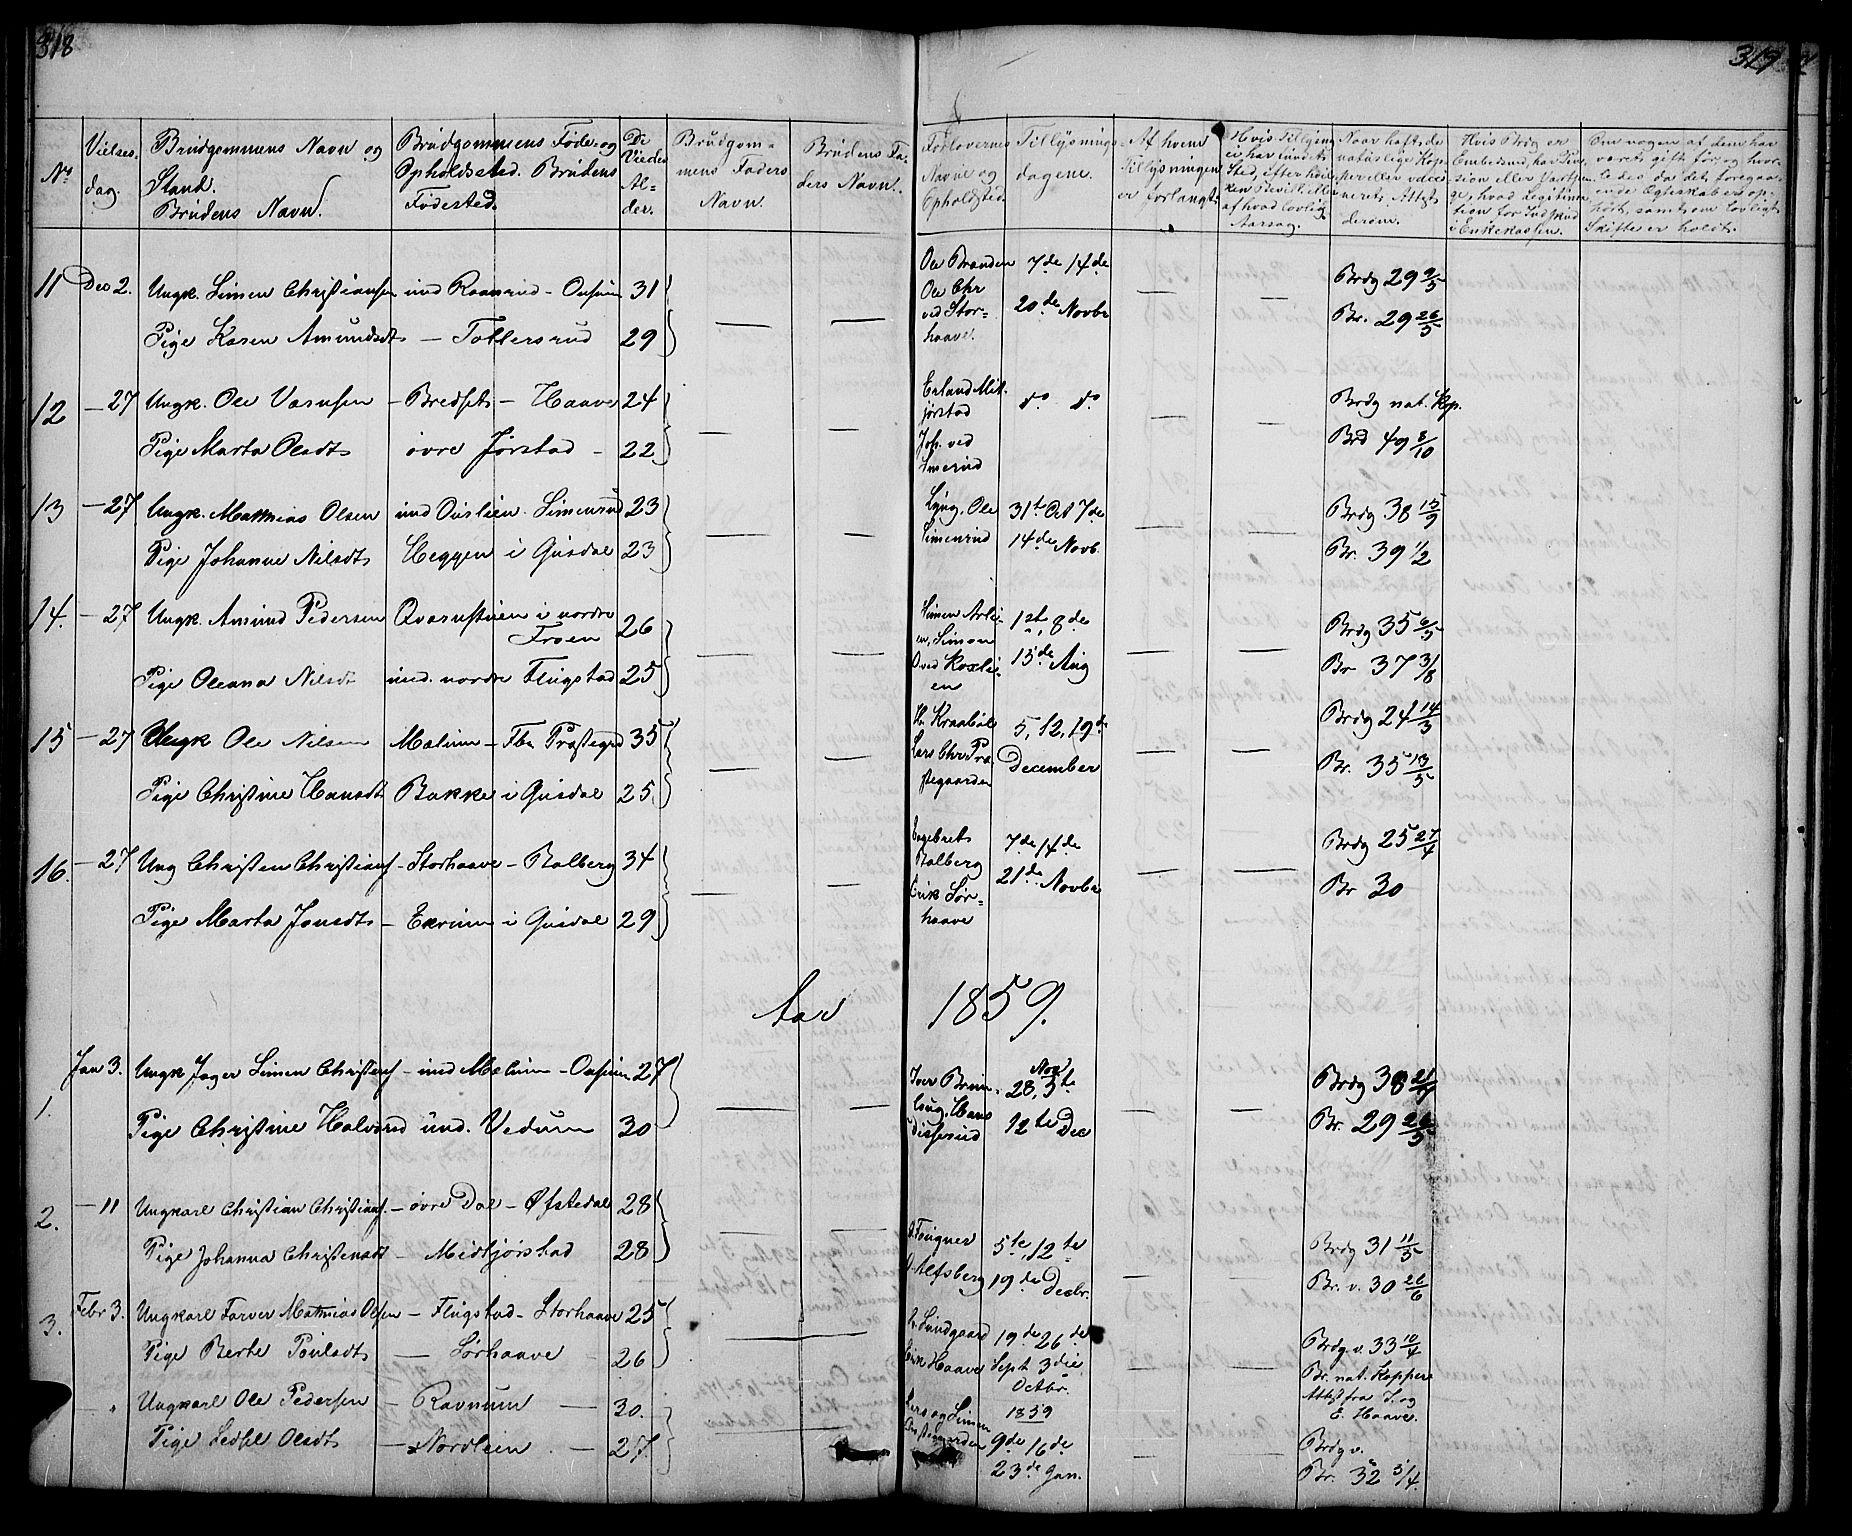 SAH, Fåberg prestekontor, Klokkerbok nr. 5, 1837-1864, s. 318-319